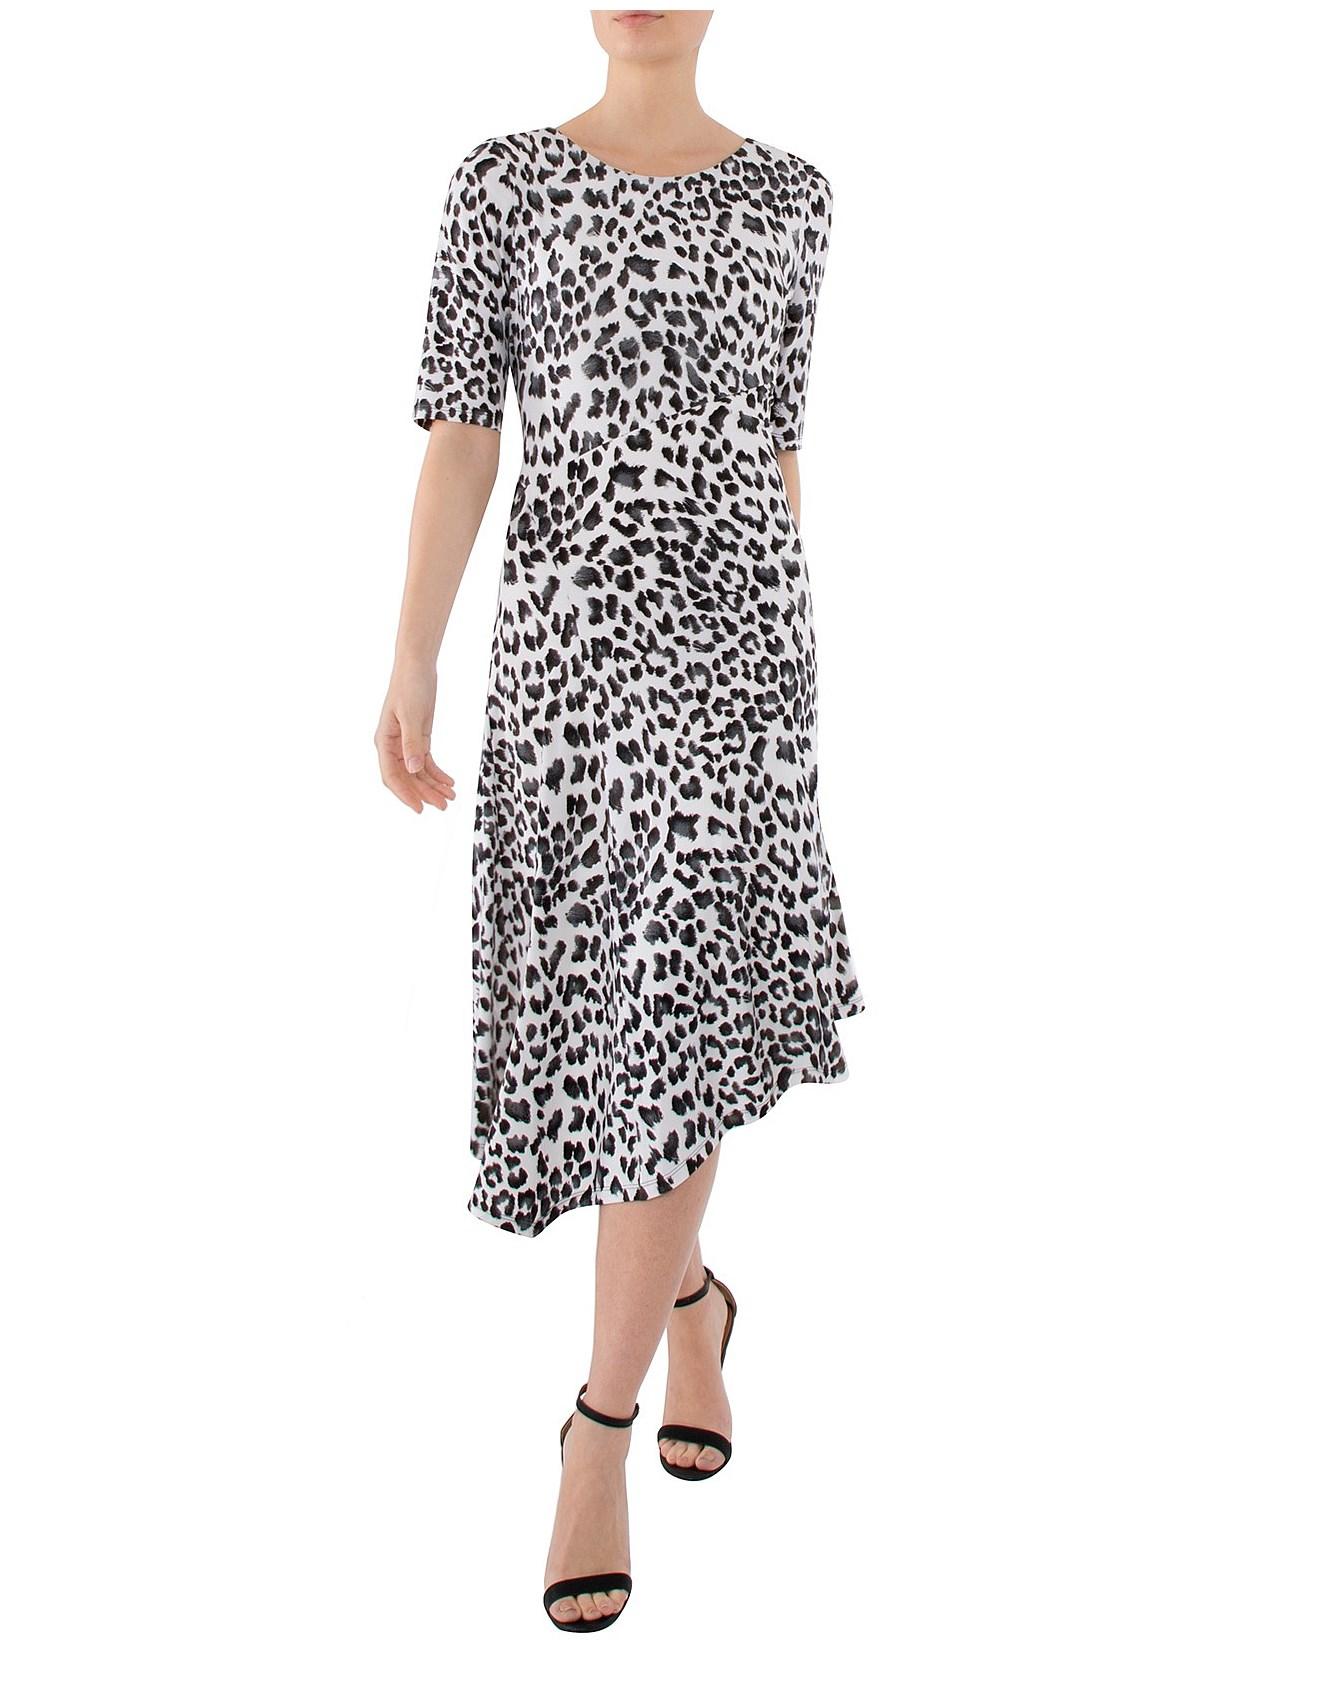 d5f094516ef Anthea Crawford | Anthea Crawford Dresses & More | David Jones ...